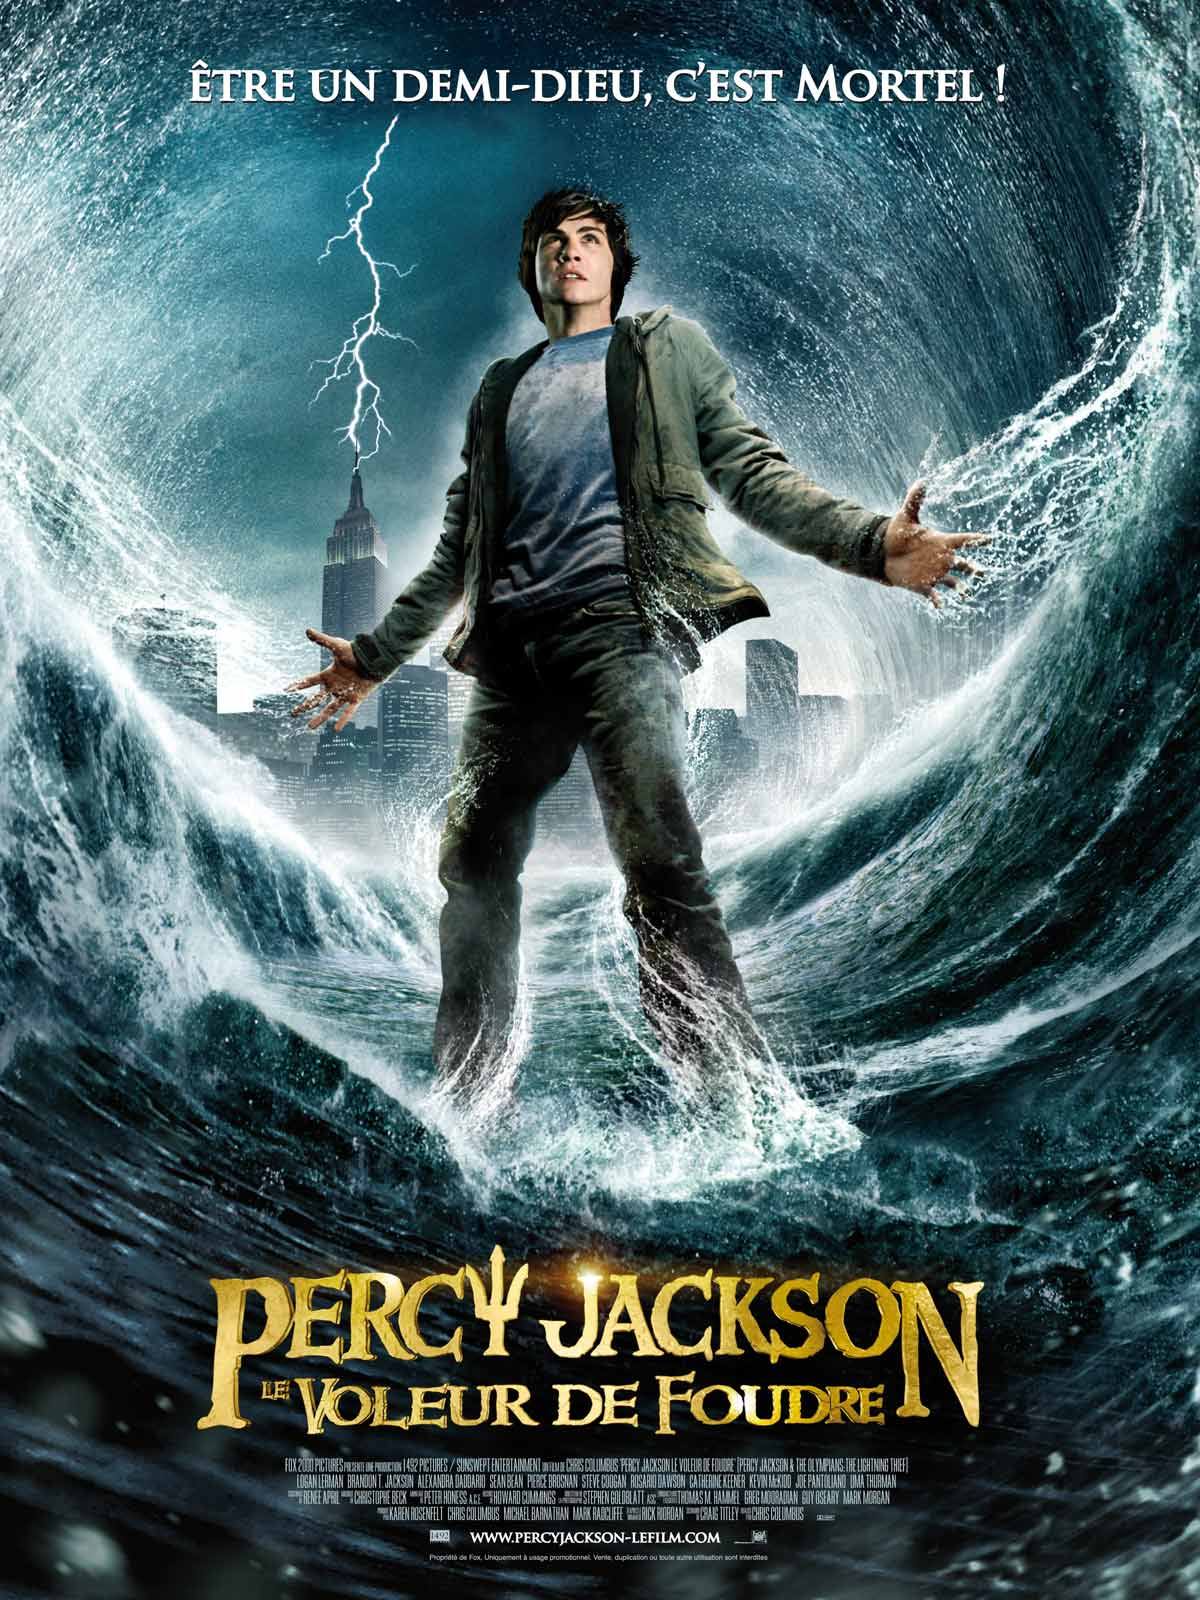 Percy Jackson The Olympians The Lightning Thief 2010 Photo Gallery Imdb